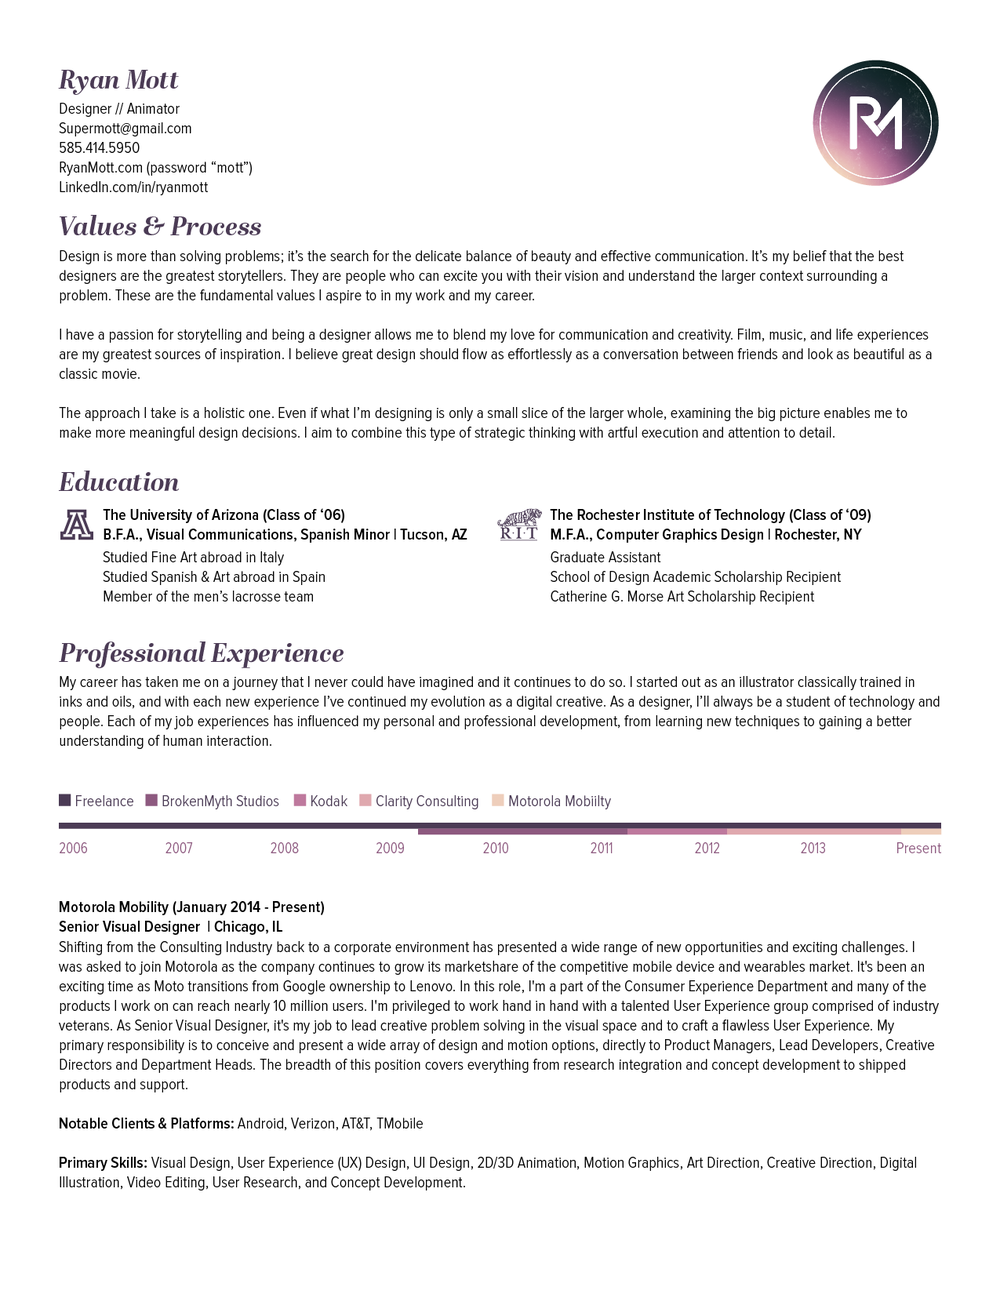 RMott Resume-01.png